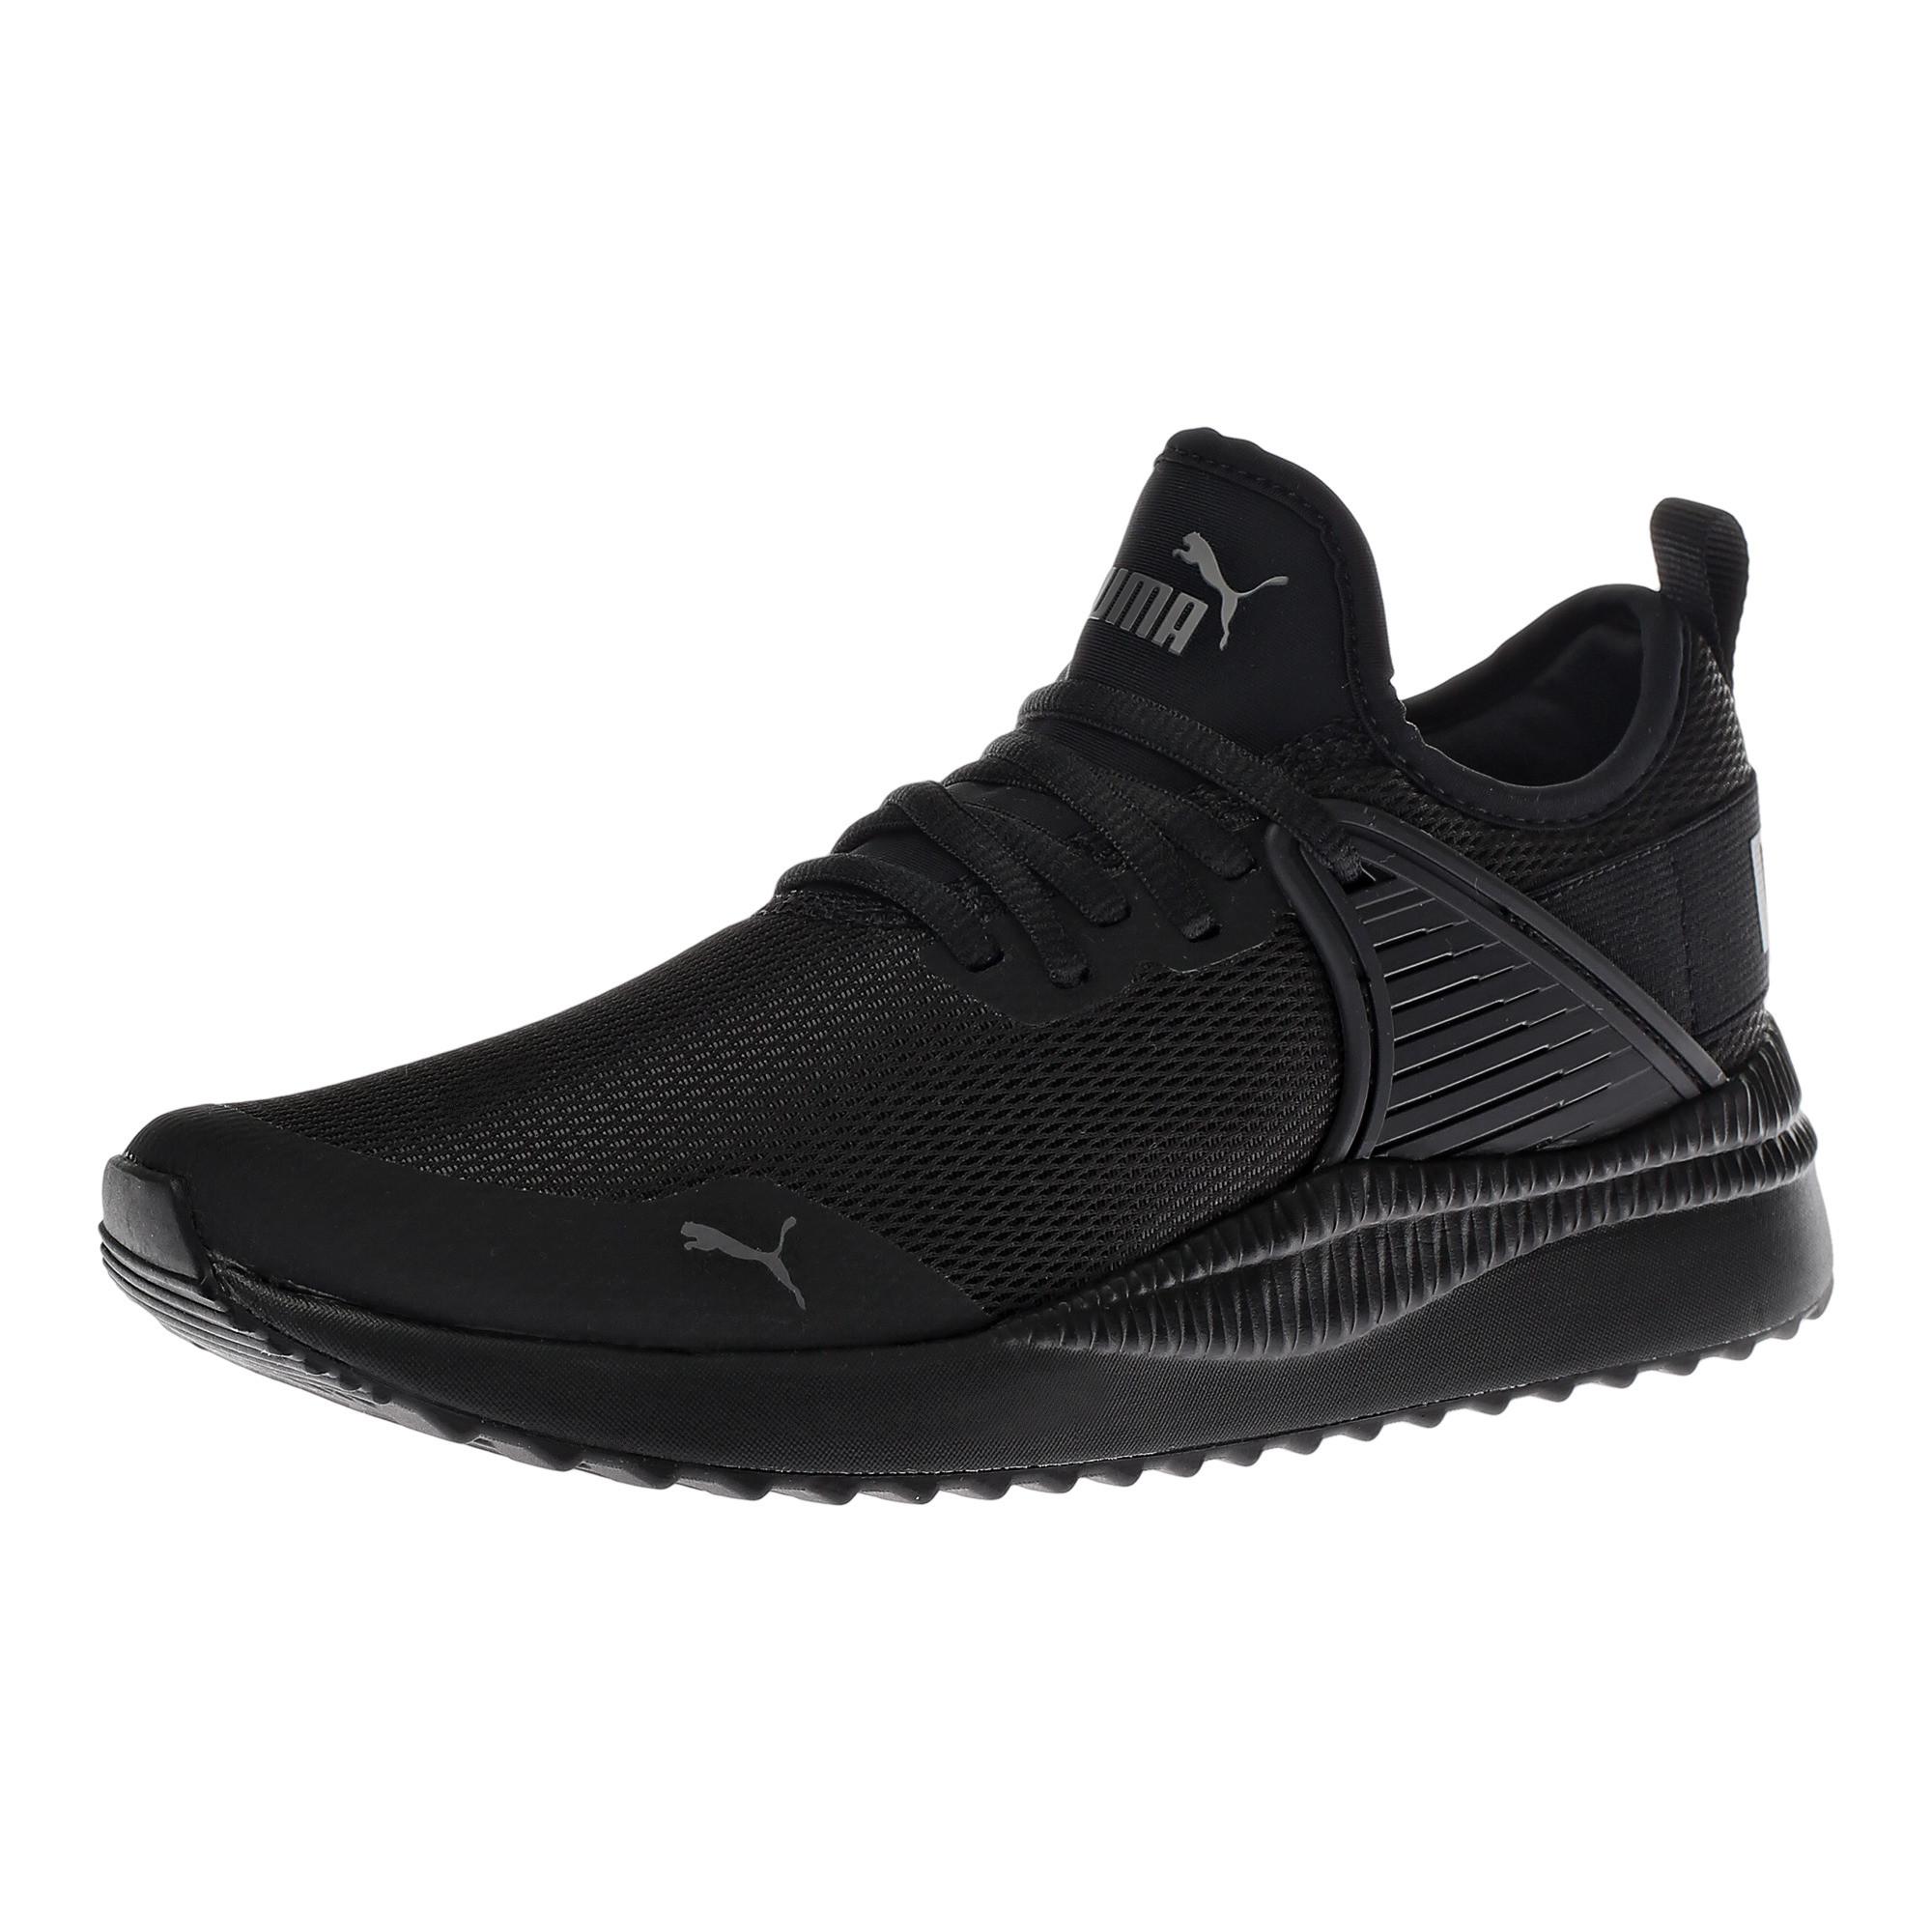 PUMA-Pacer-Next-Cage-Sneakers-JR-Boys-Shoe-Kids thumbnail 4